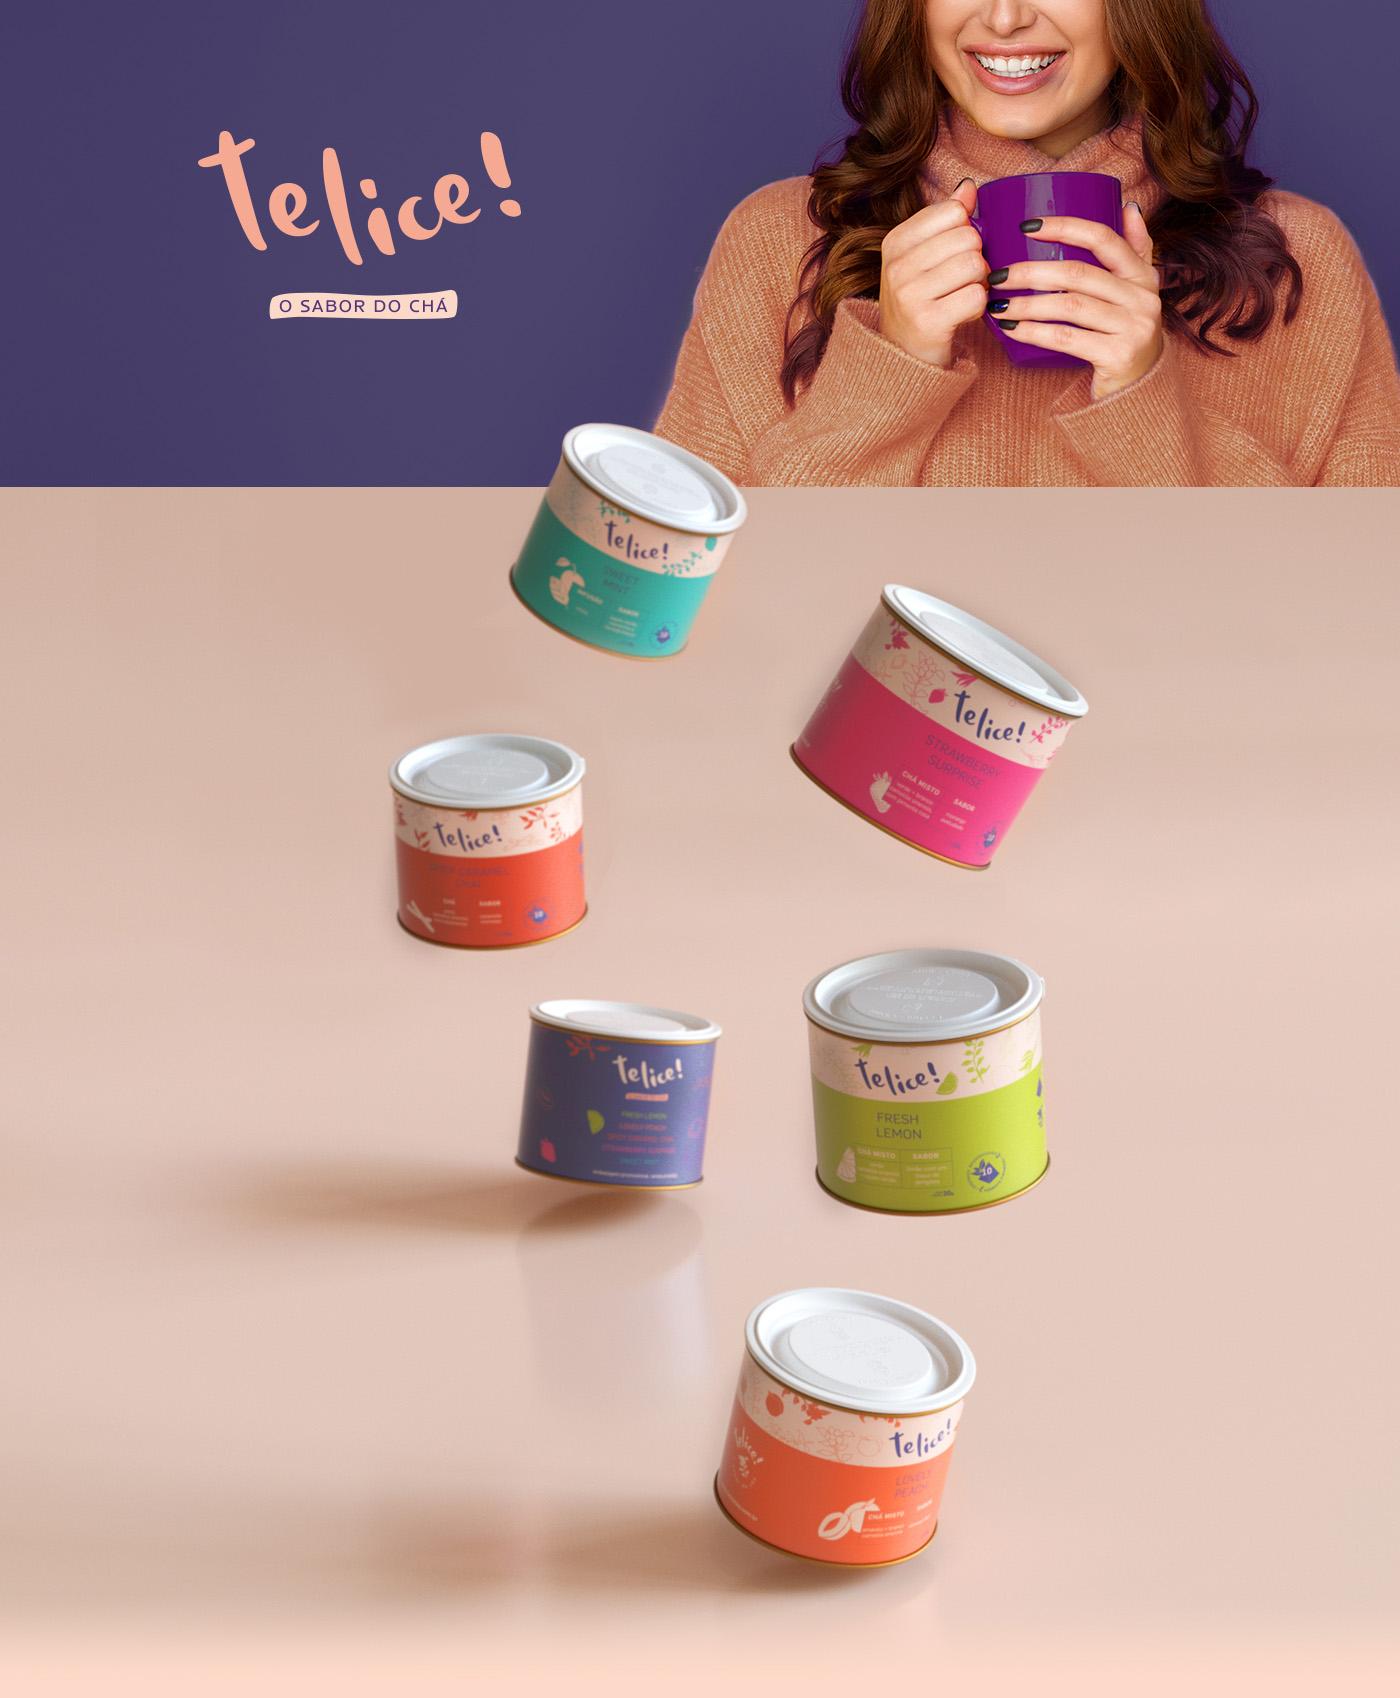 Telice Tea Visual Identity and Packaging Designed by Fernanda Galindo